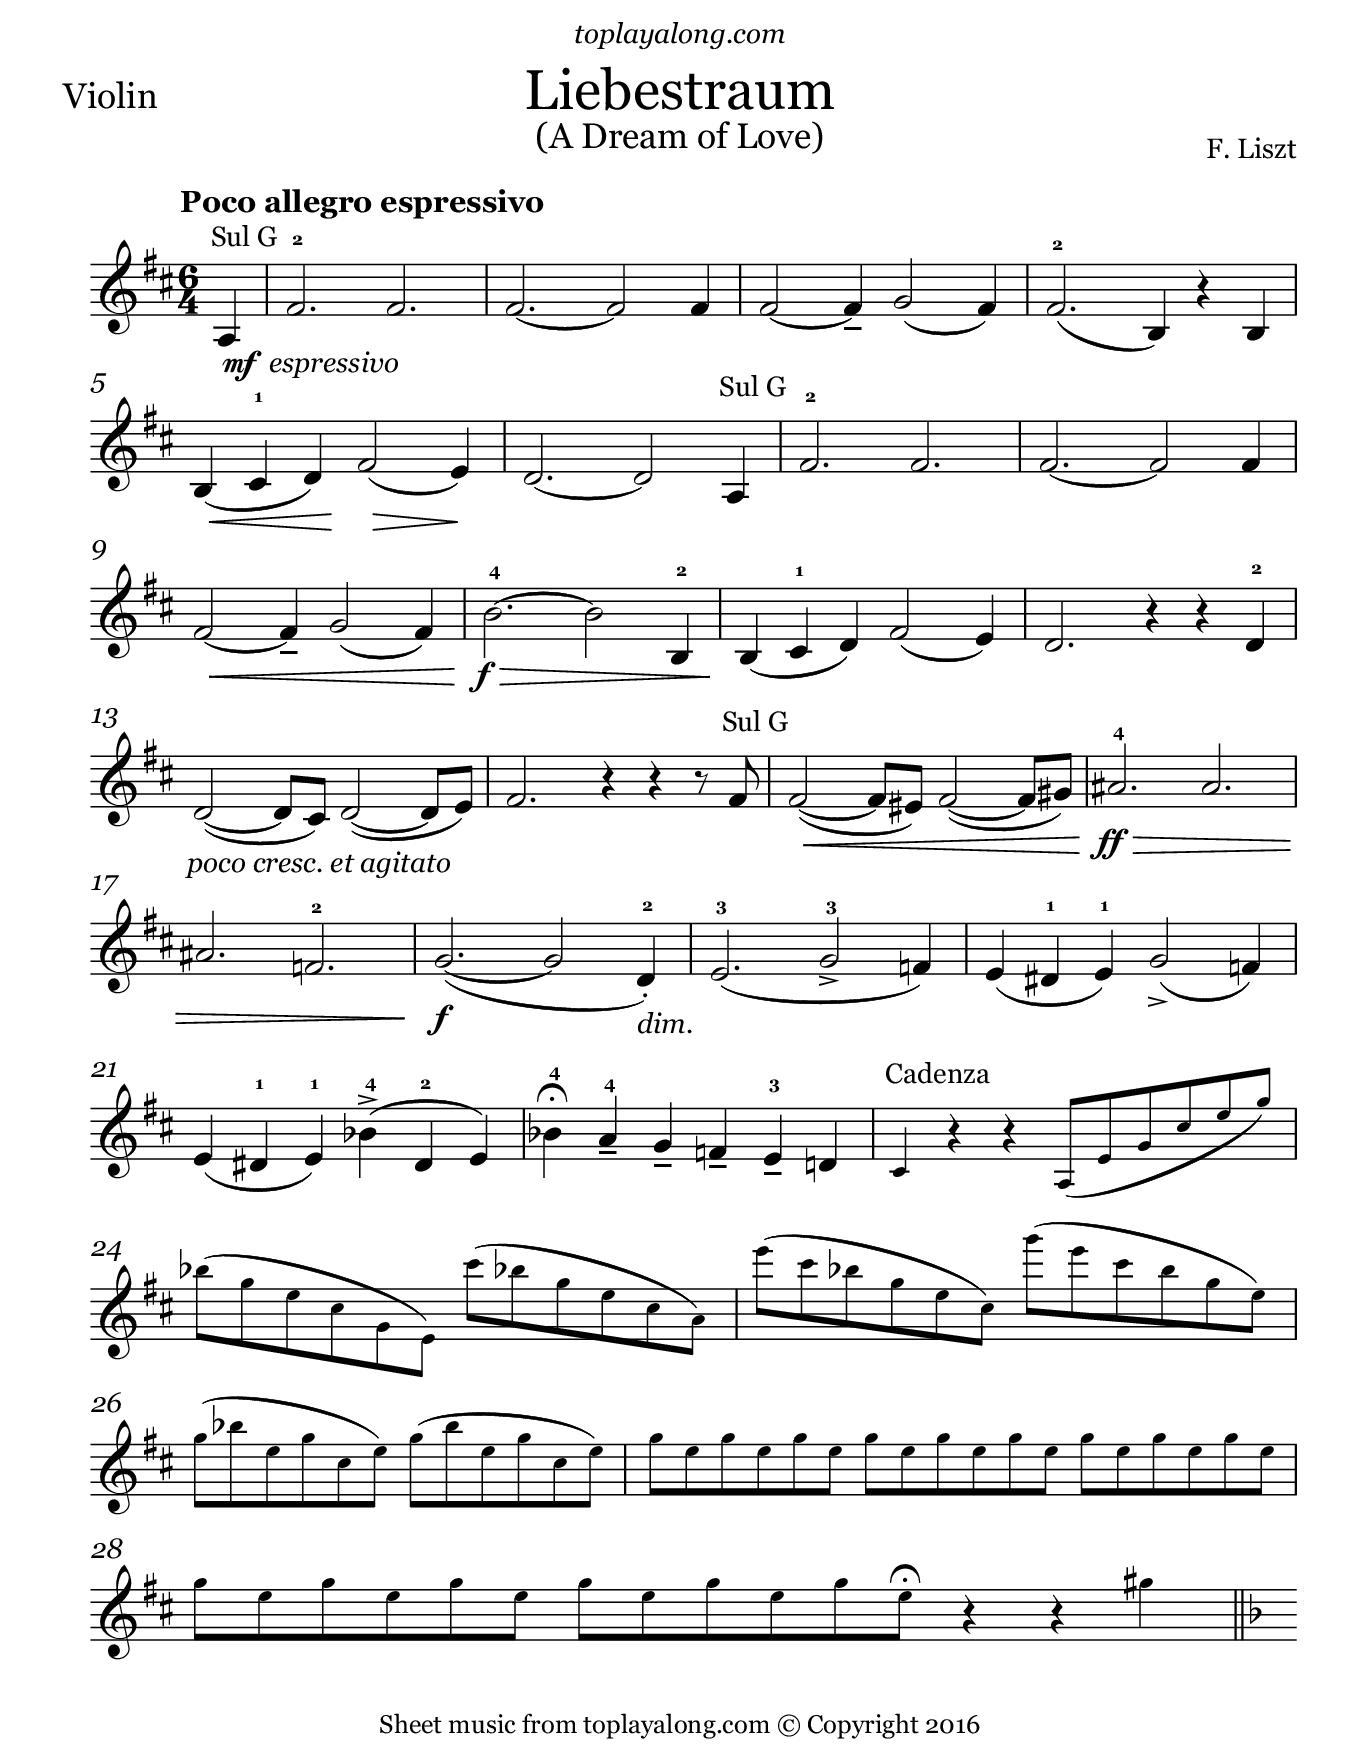 Liebestraum No 3 Toplayalongcom